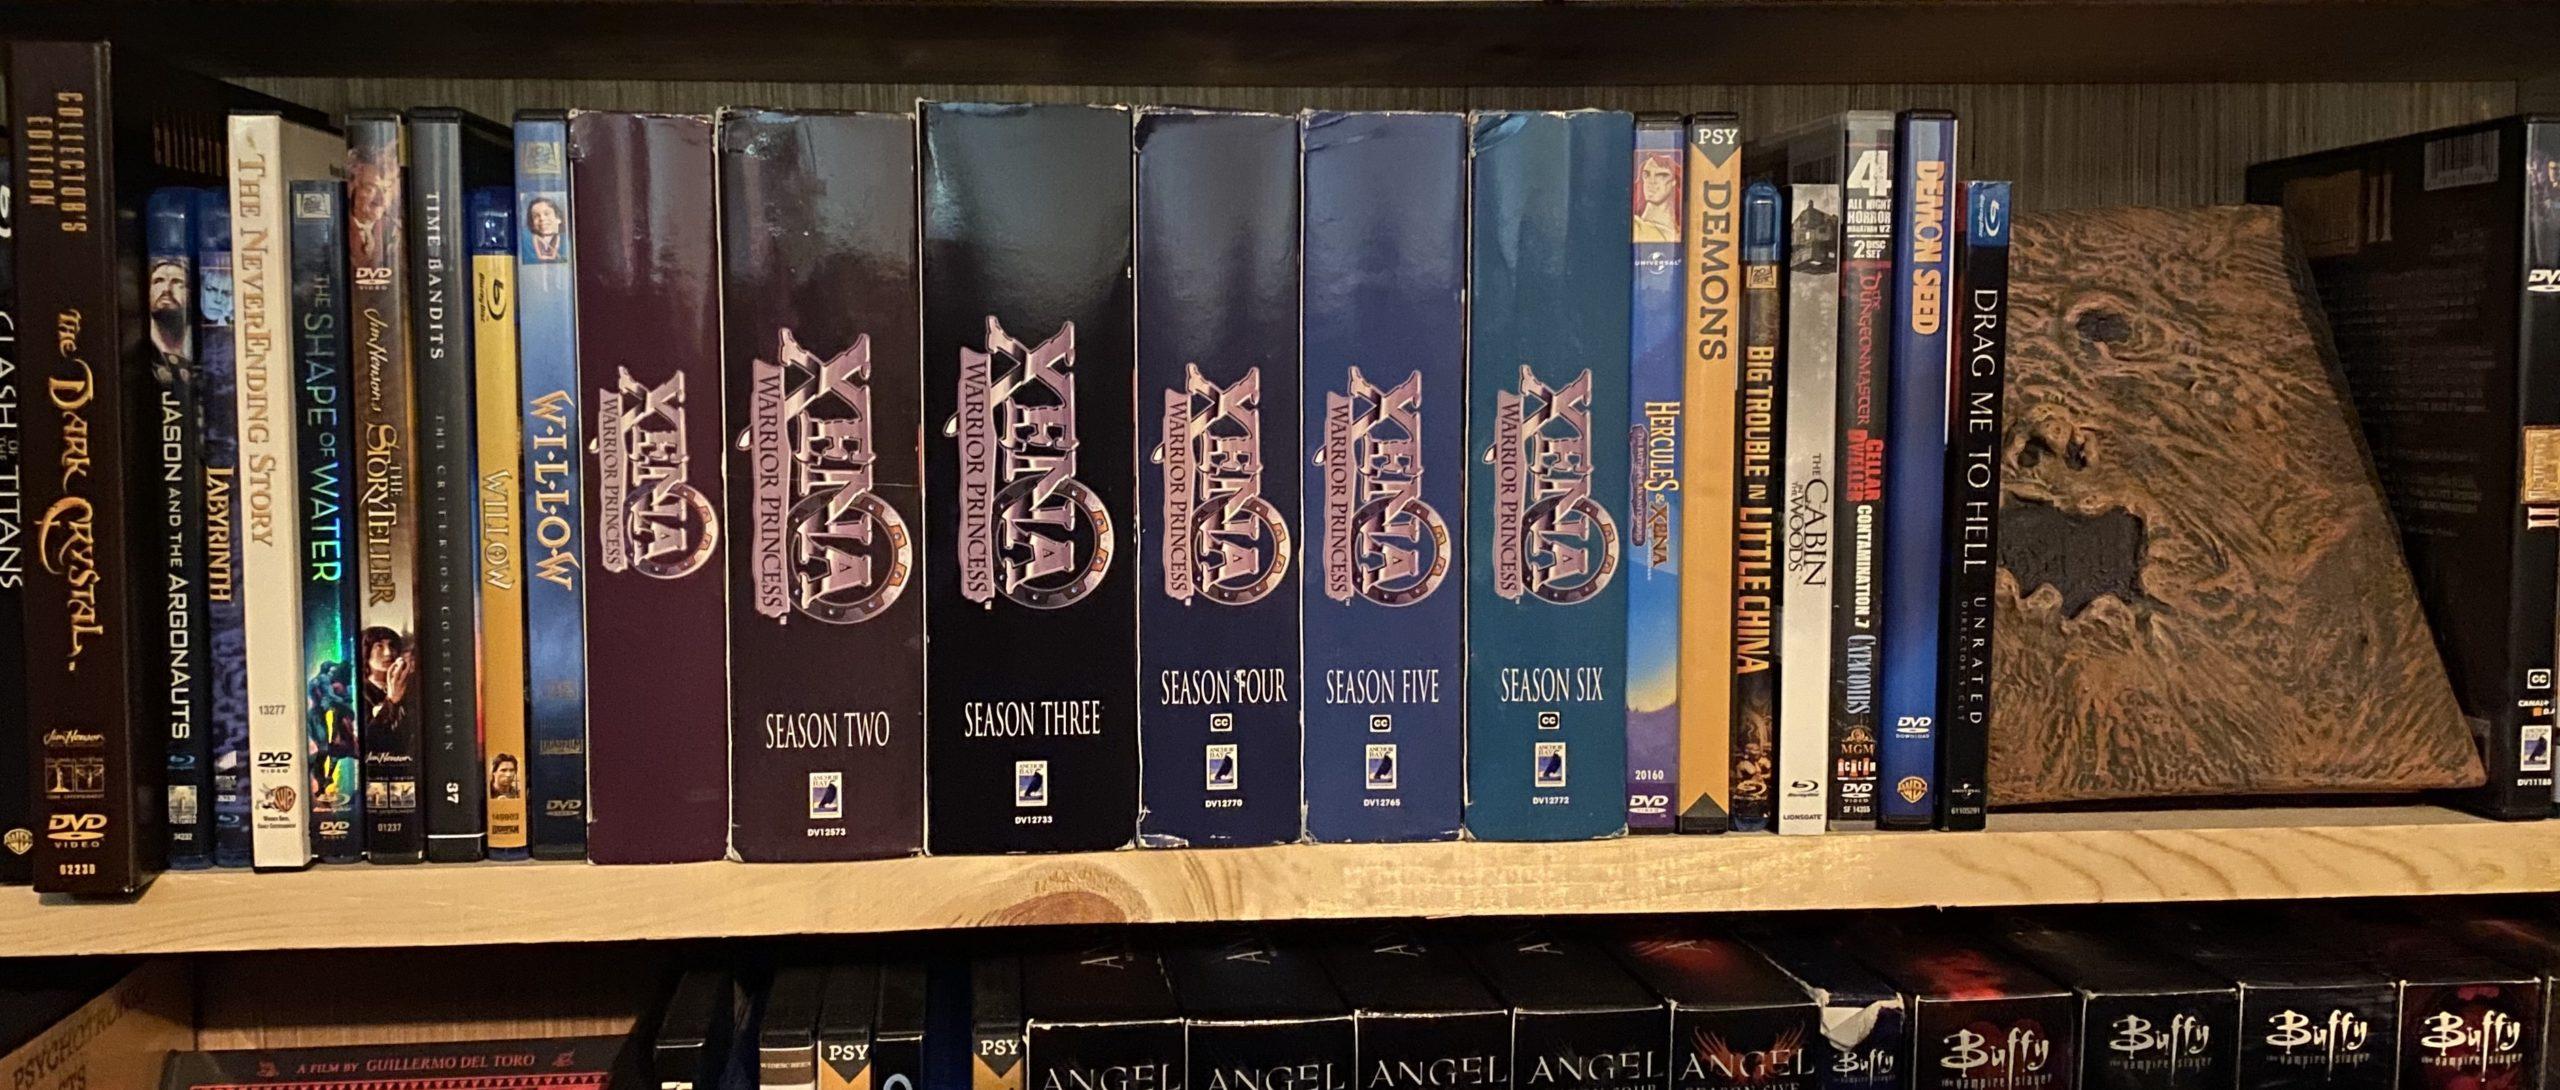 Xena DVDs on a bookshelf